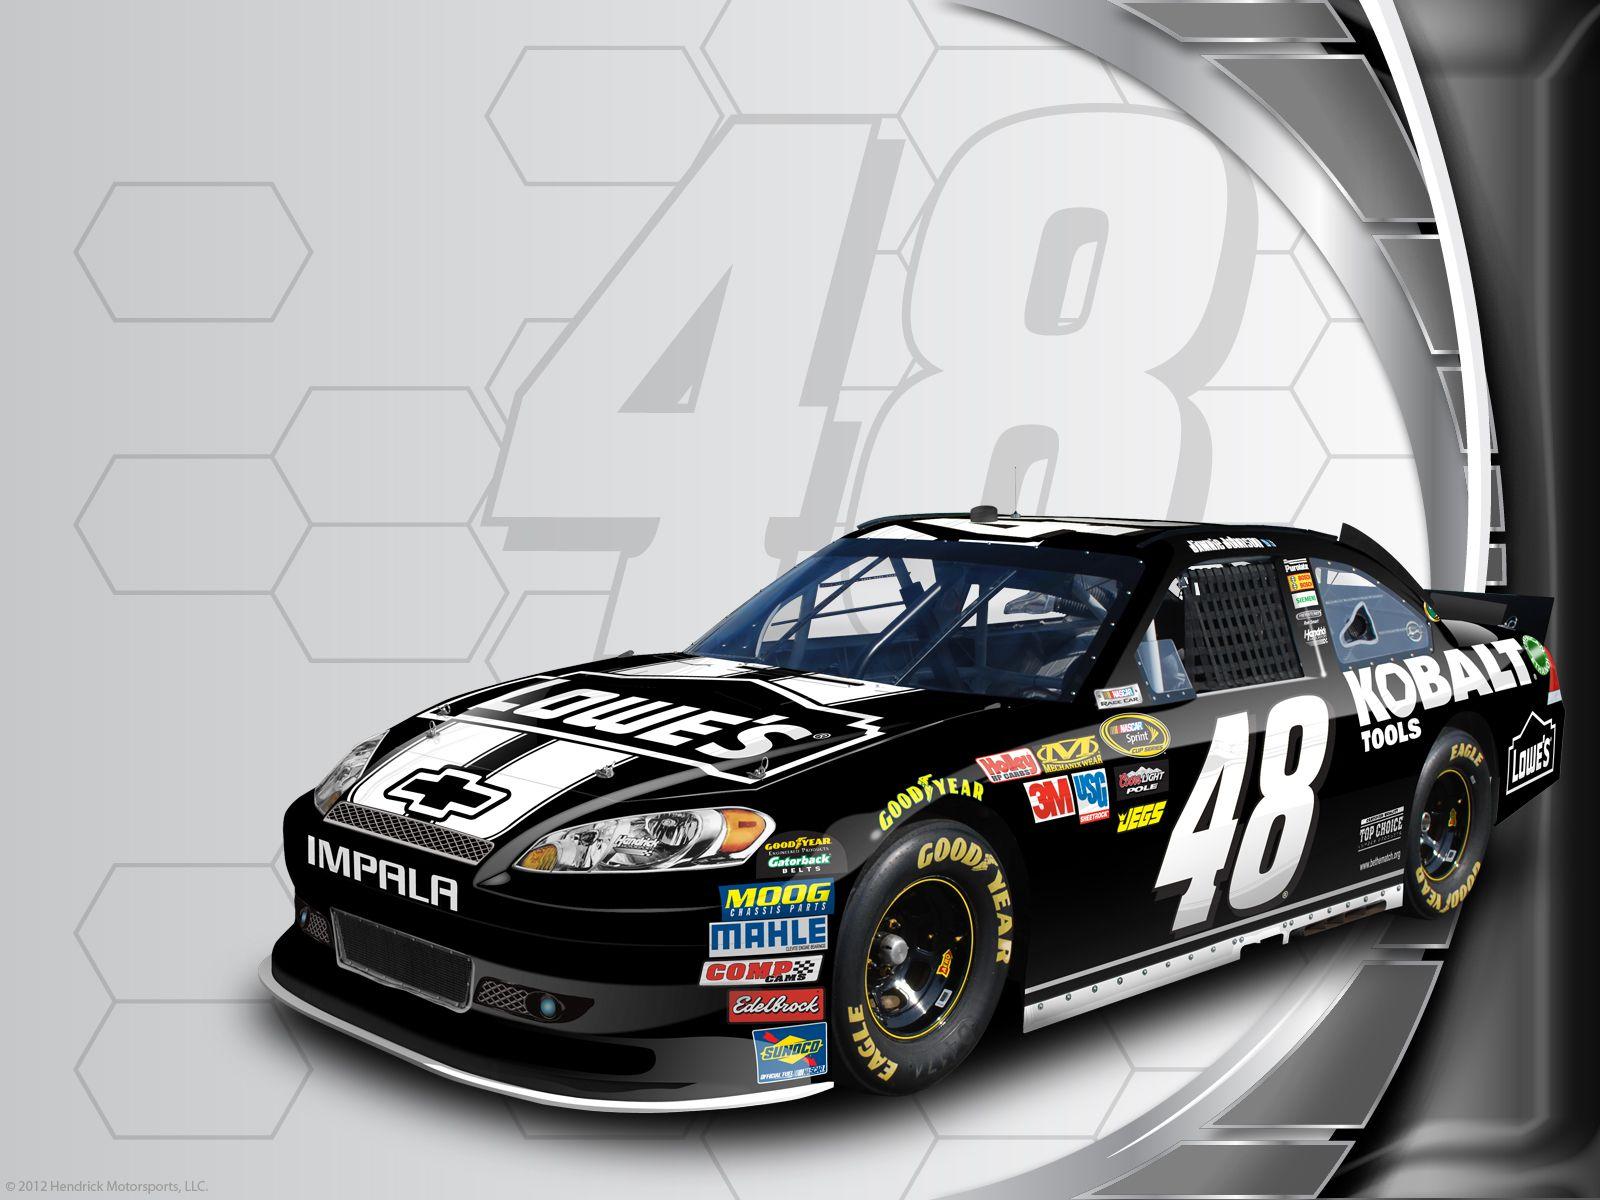 Jimmie Johnson S No 48 Kobalt Tools Lowe S Chevrolet Desktop Wallpaper Nascar Racing Nascar Race Cars Nascar